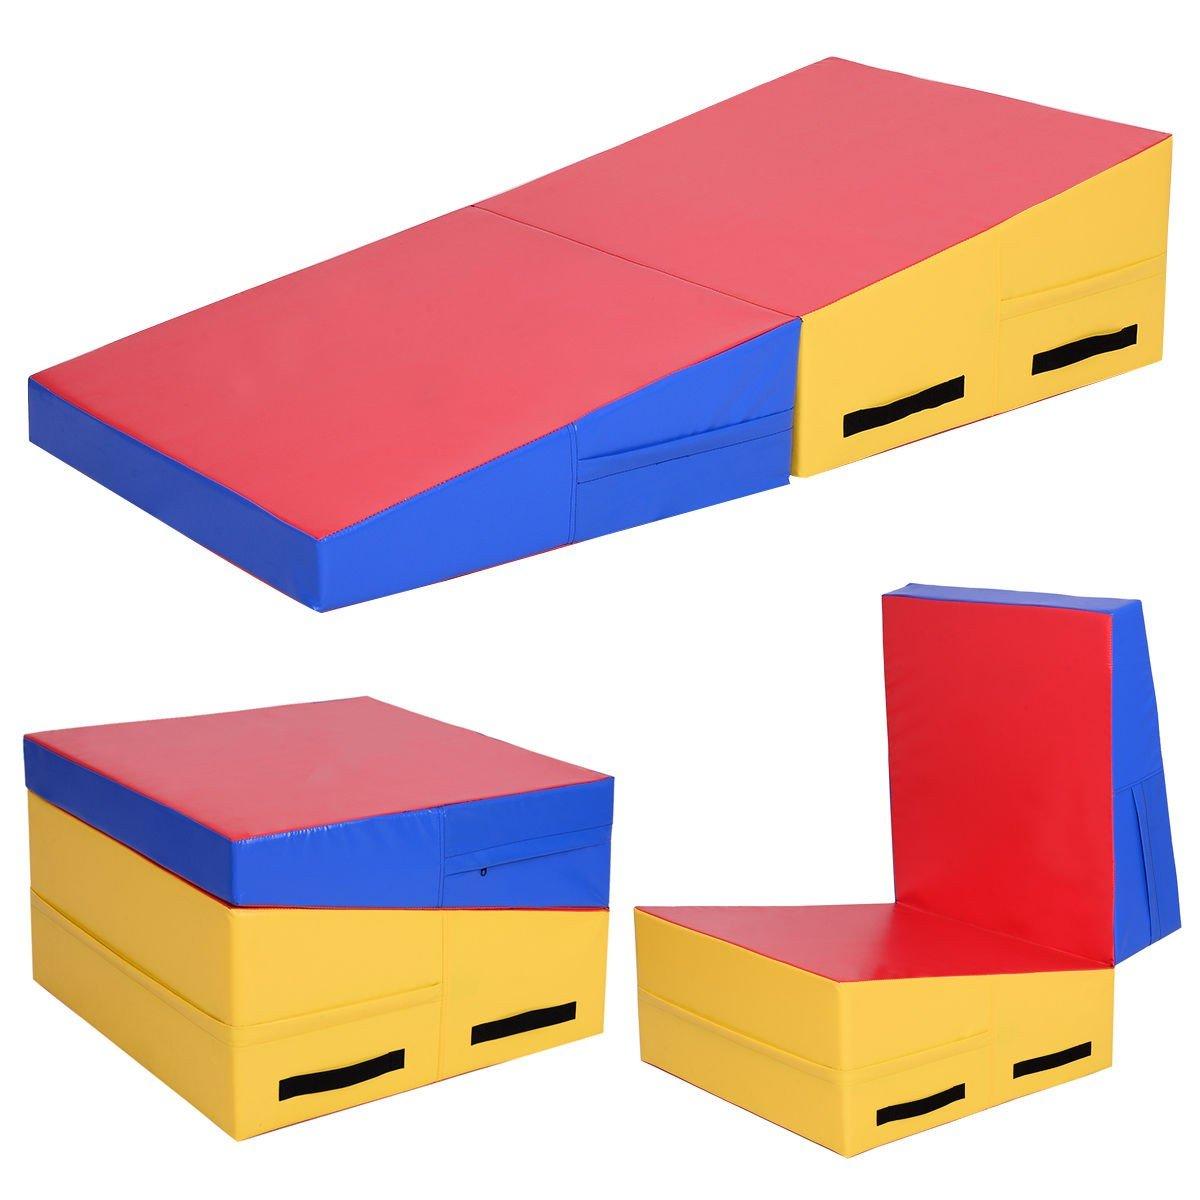 Folding Incline体操練習マット – by Choice製品   B074J8RDHB